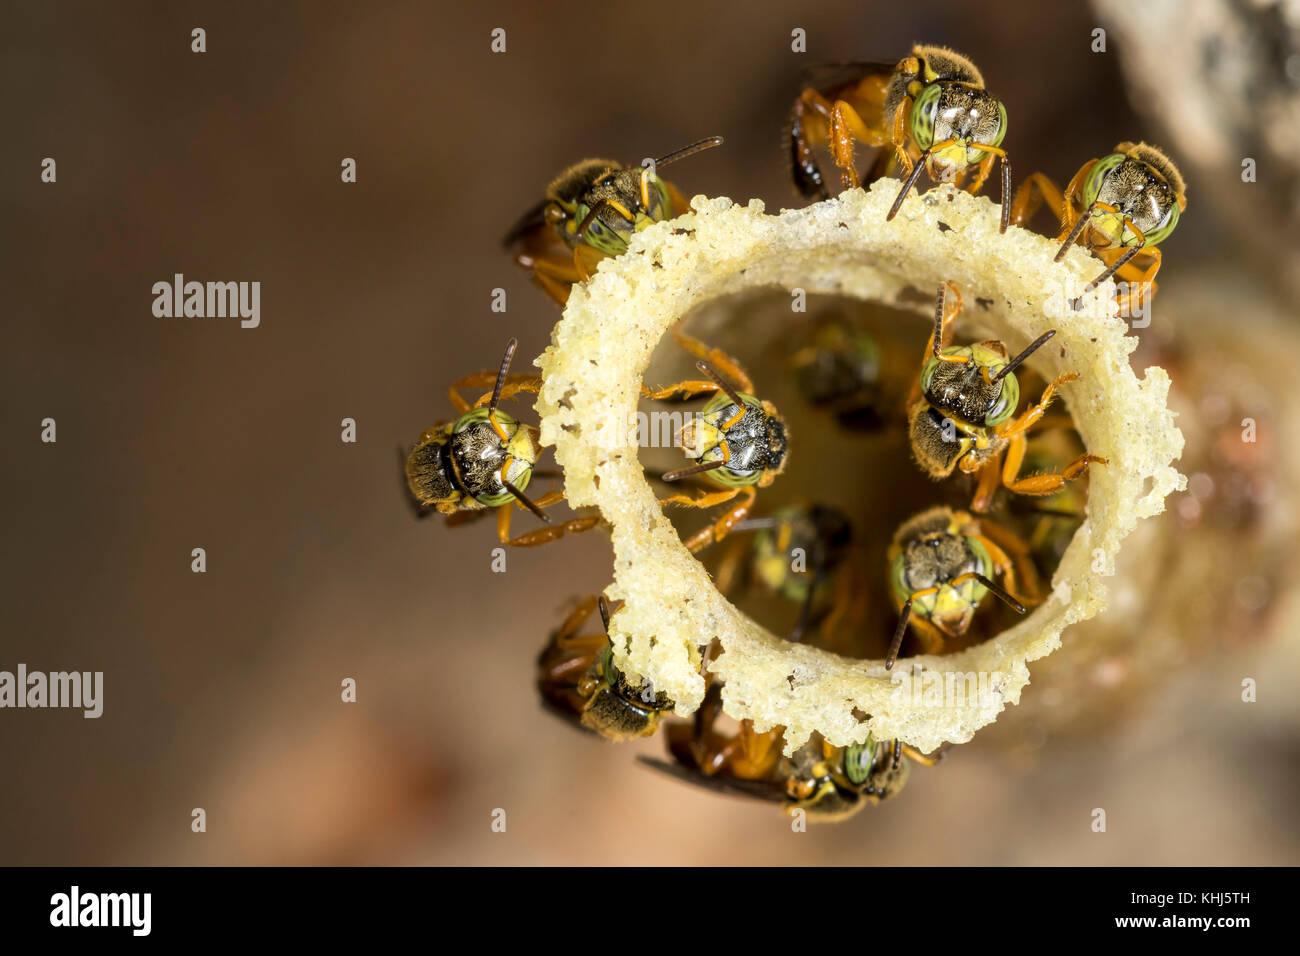 jatai stingless bee at the wax entrance to their hive - tetragonisca angustula - Stock Image